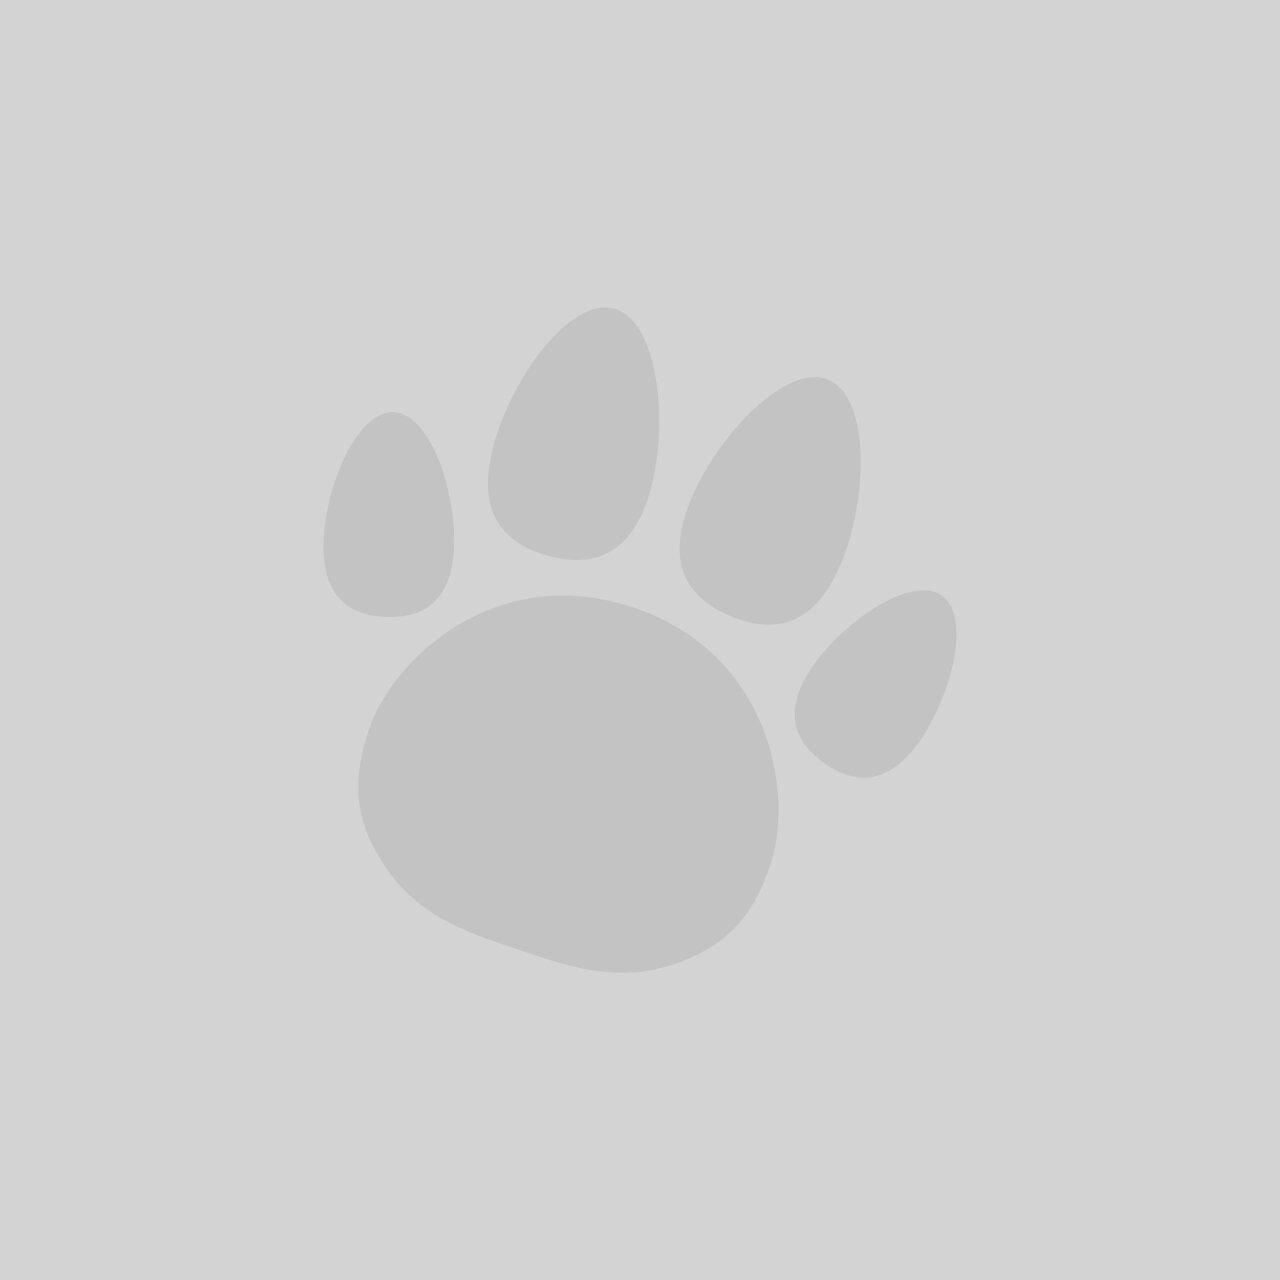 Stunning Vapet Get Off My Garden Crystals G With Licious Fairview Gardens Besides The Garden Lighting Shop Furthermore Garden Trimmer With Amusing Metal Garden Wall Art Outdoor Uk Also Garden Centres Uk In Addition Large Garden Ideas And Covent Garden Odeon As Well As Stone Dogs For Garden Additionally Garden Gnome Origin From Jollyescouk With   Licious Vapet Get Off My Garden Crystals G With Amusing Fairview Gardens Besides The Garden Lighting Shop Furthermore Garden Trimmer And Stunning Metal Garden Wall Art Outdoor Uk Also Garden Centres Uk In Addition Large Garden Ideas From Jollyescouk